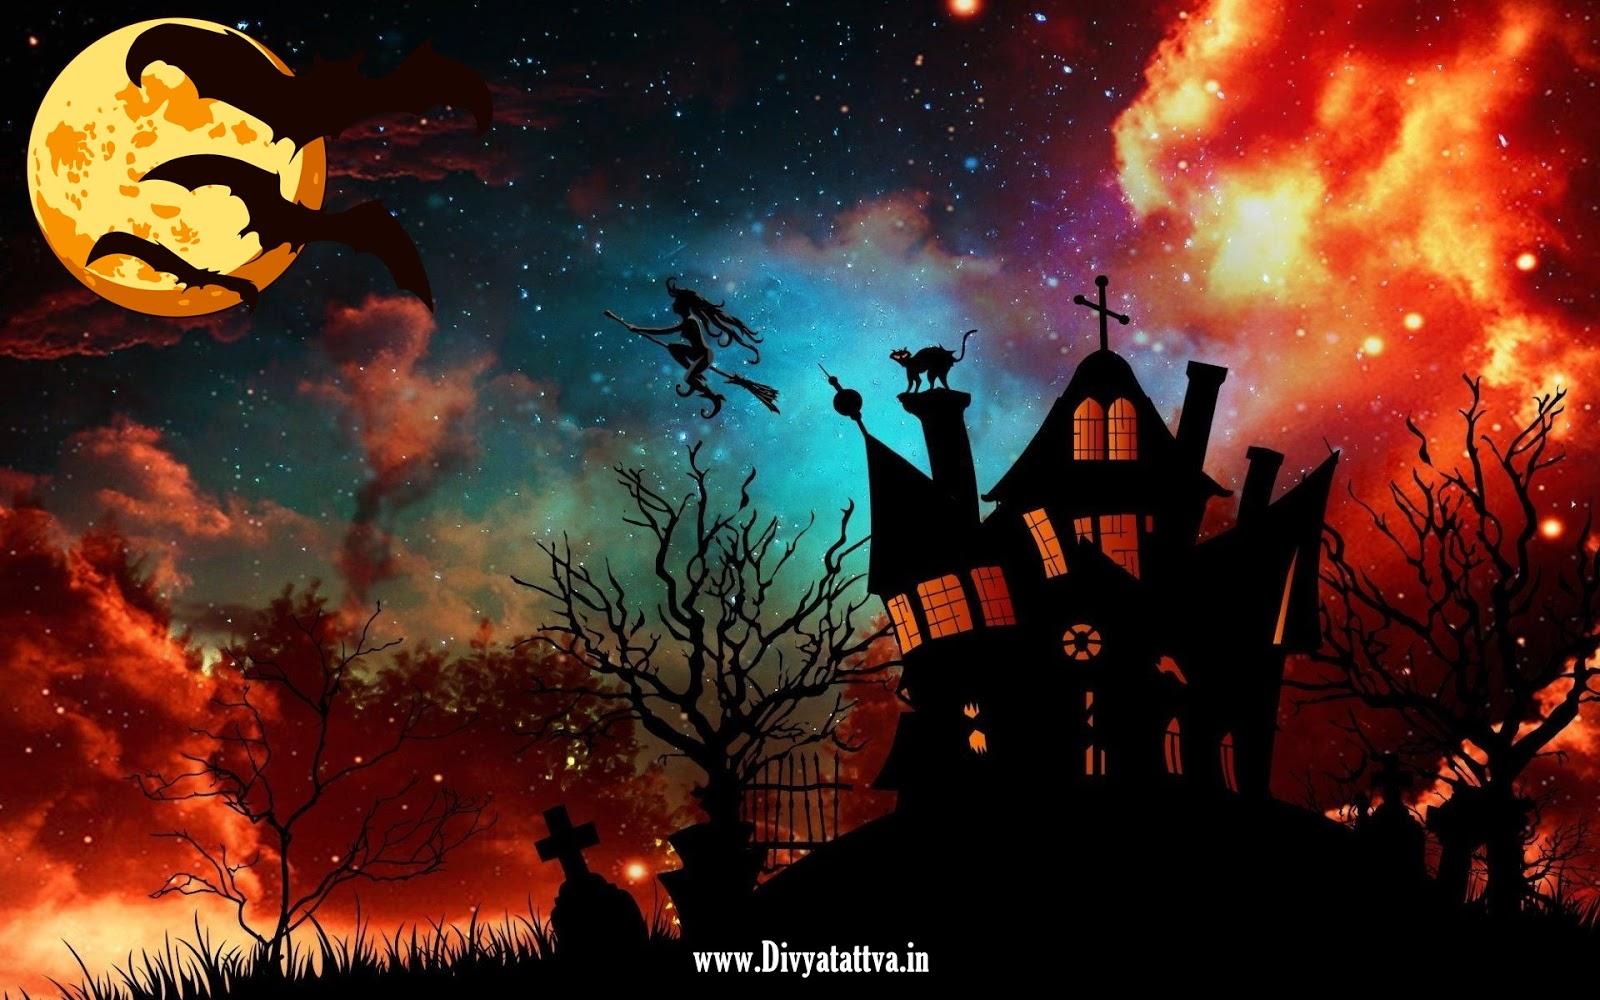 Halloween Hd Wallpapers, Scary Background Images, Download - Scary Halloween Backgrounds - 1600x1000 Wallpaper - teahub.io